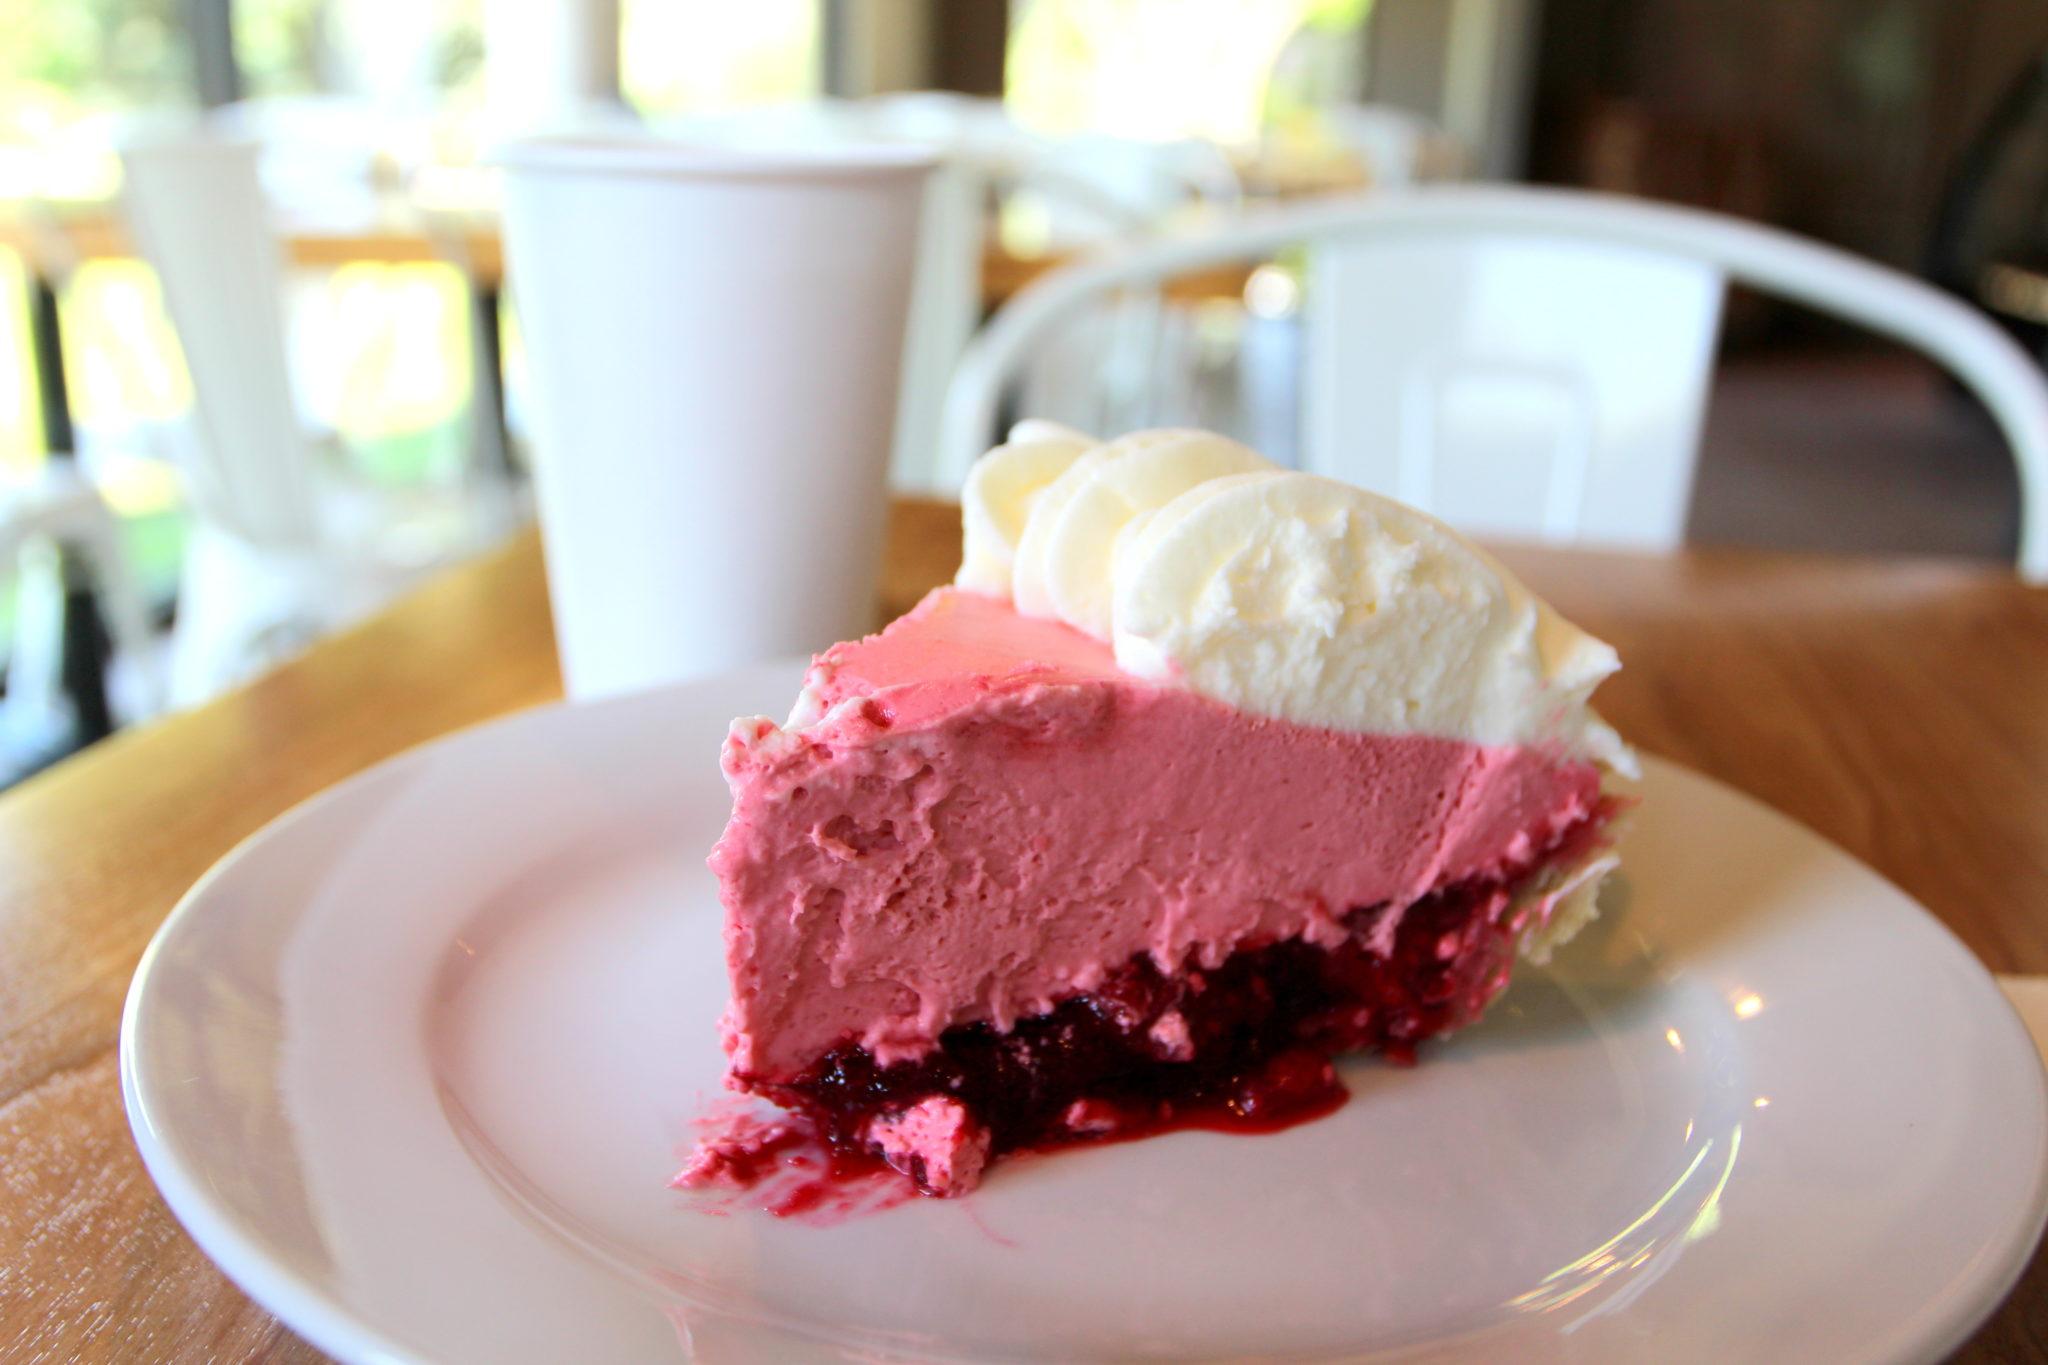 rogers-fork-and-crust-raspberry-chiffon-pie-by-kat-robinson.jpg